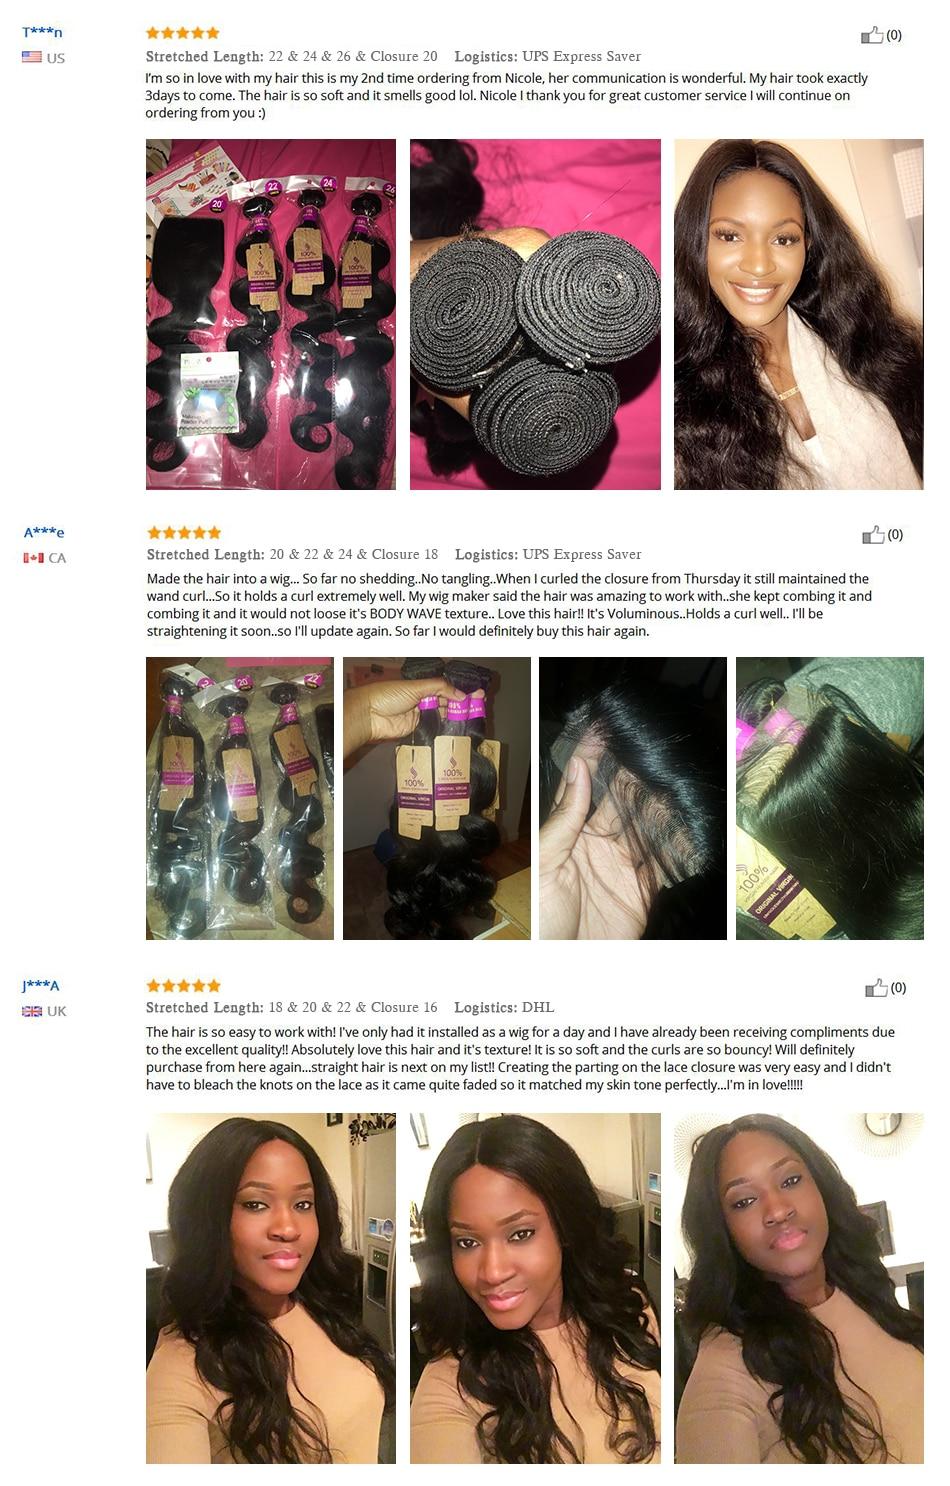 HTB156LZk26H8KJjy0Fjq6yXepXaI Recool Hair Body Wave Bundles With Closure Remy Hair 6x6 and 5x5 Bundles With Closure Peruvian Human Hair 3 Bundles With Closure